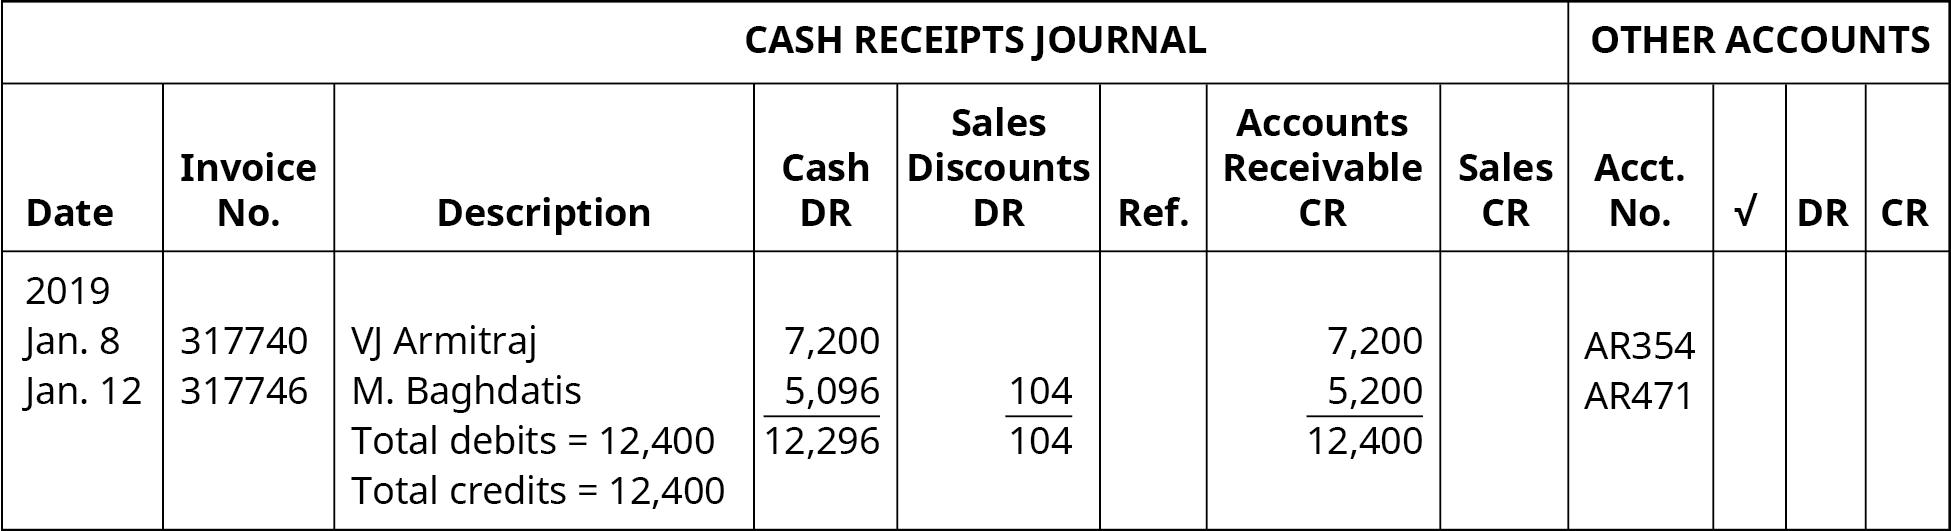 Cash Receipts Journal, Other Accounts. Nine columns, labeled left to right: Date, Invoice Number, Description, Cash DR, Sales Discounts DR, Ref., Accounts Receivable CR, Sales CR, Account Number. Line One: January 8, 2019; 317740; VJ Armitraj; 7,200; Blank; Blank; 7,200; Blank; AR354. Line Two: January 12, 2019; 317746; M. Baghdatis; 5,096; 104; Blank; 5,200; Blank; AR471. Line Three: Blank, Blank, Total debits = 12,400; 12,296; 104; Blank; 12,400; Blank; Blank. Line Four: Blank; Blank; Total credits = 12,400; Blank; Blank; Blank; Blank; Blank; Blank.